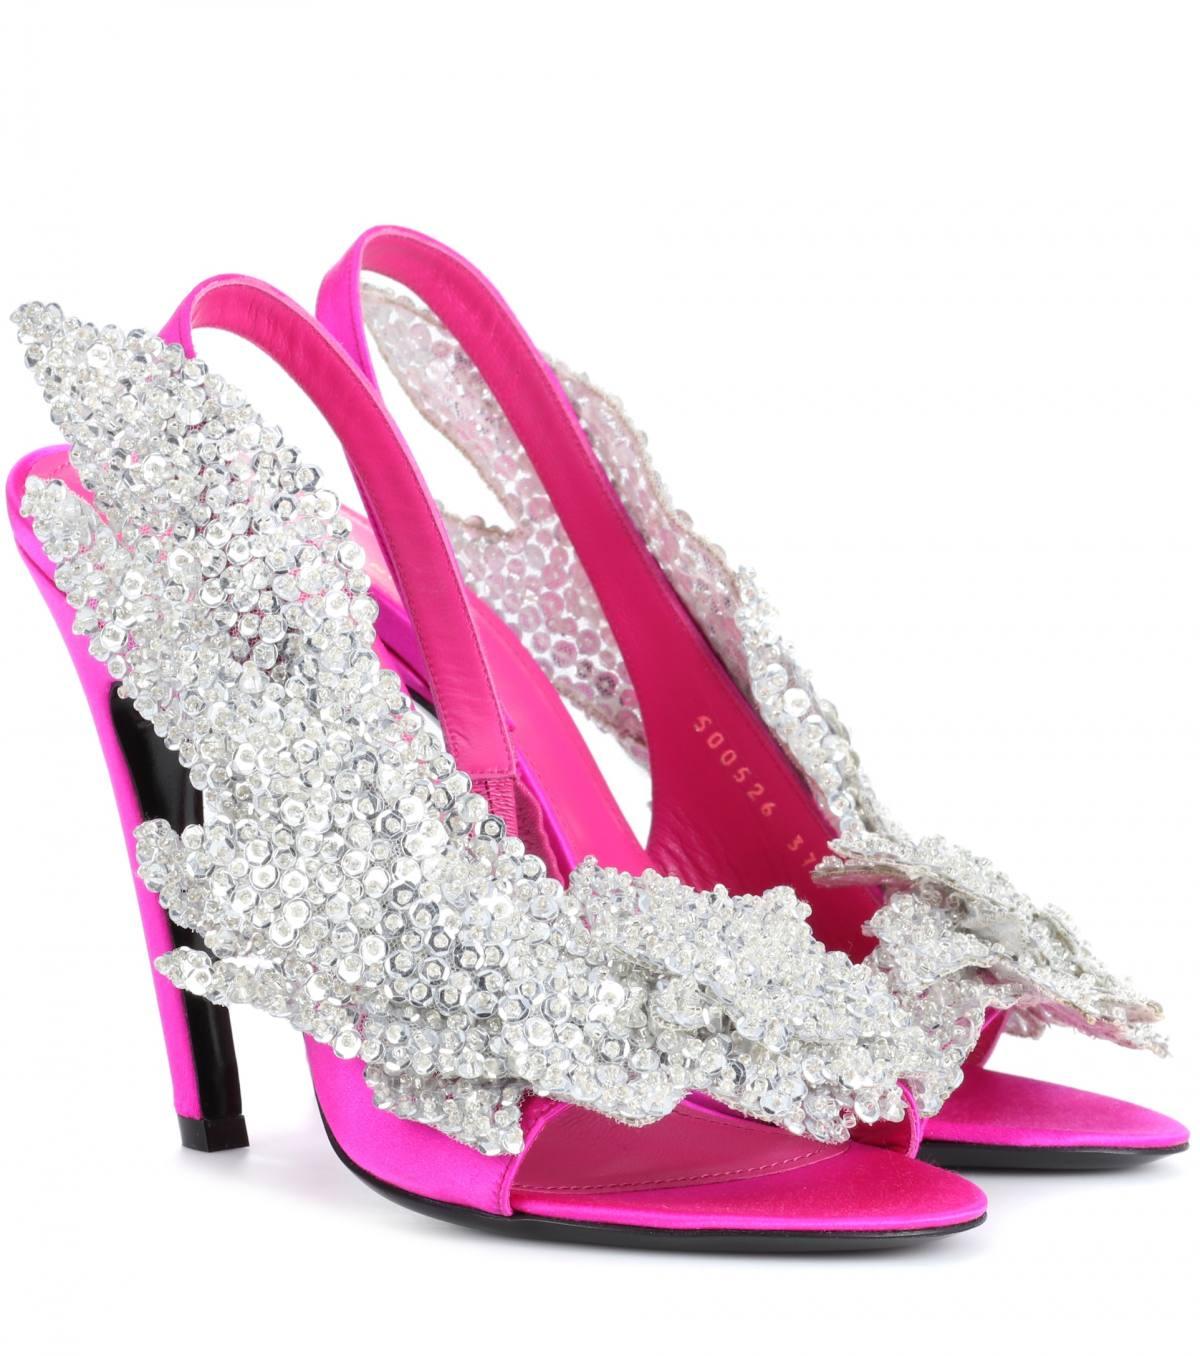 Embellished satin sandals by Balenciaga, available on mytheresa.com for $1390 Kim Kardashian Shoes Exact Product